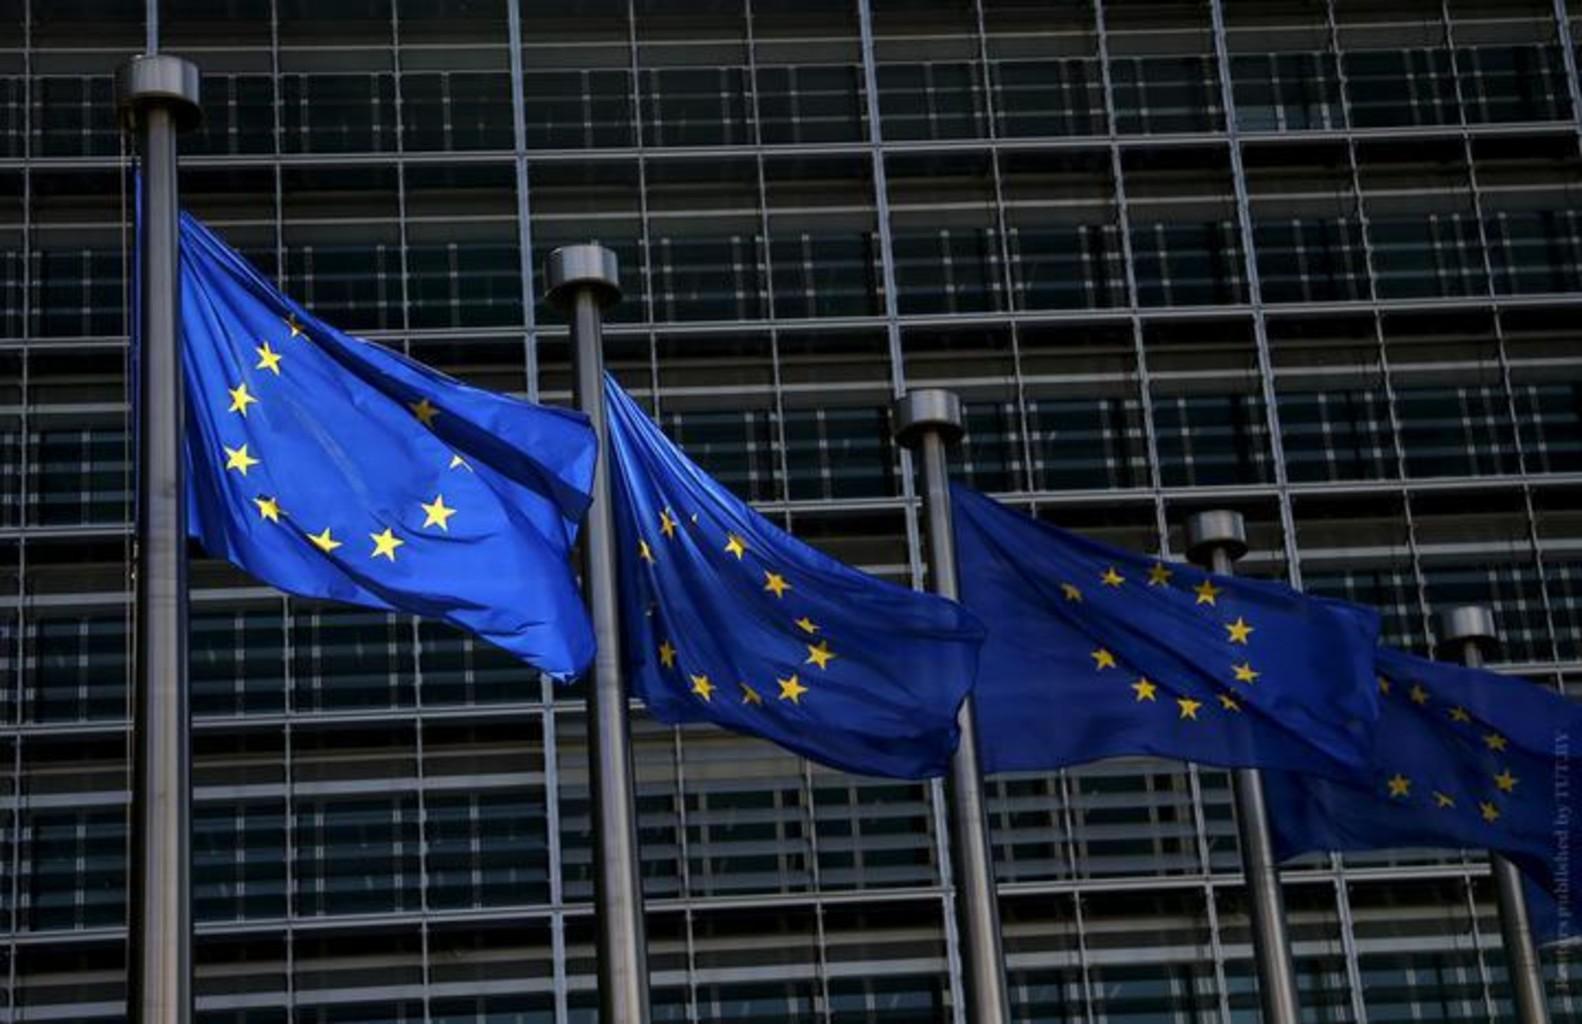 Flag evrosoyuz reuters rtx1crgh